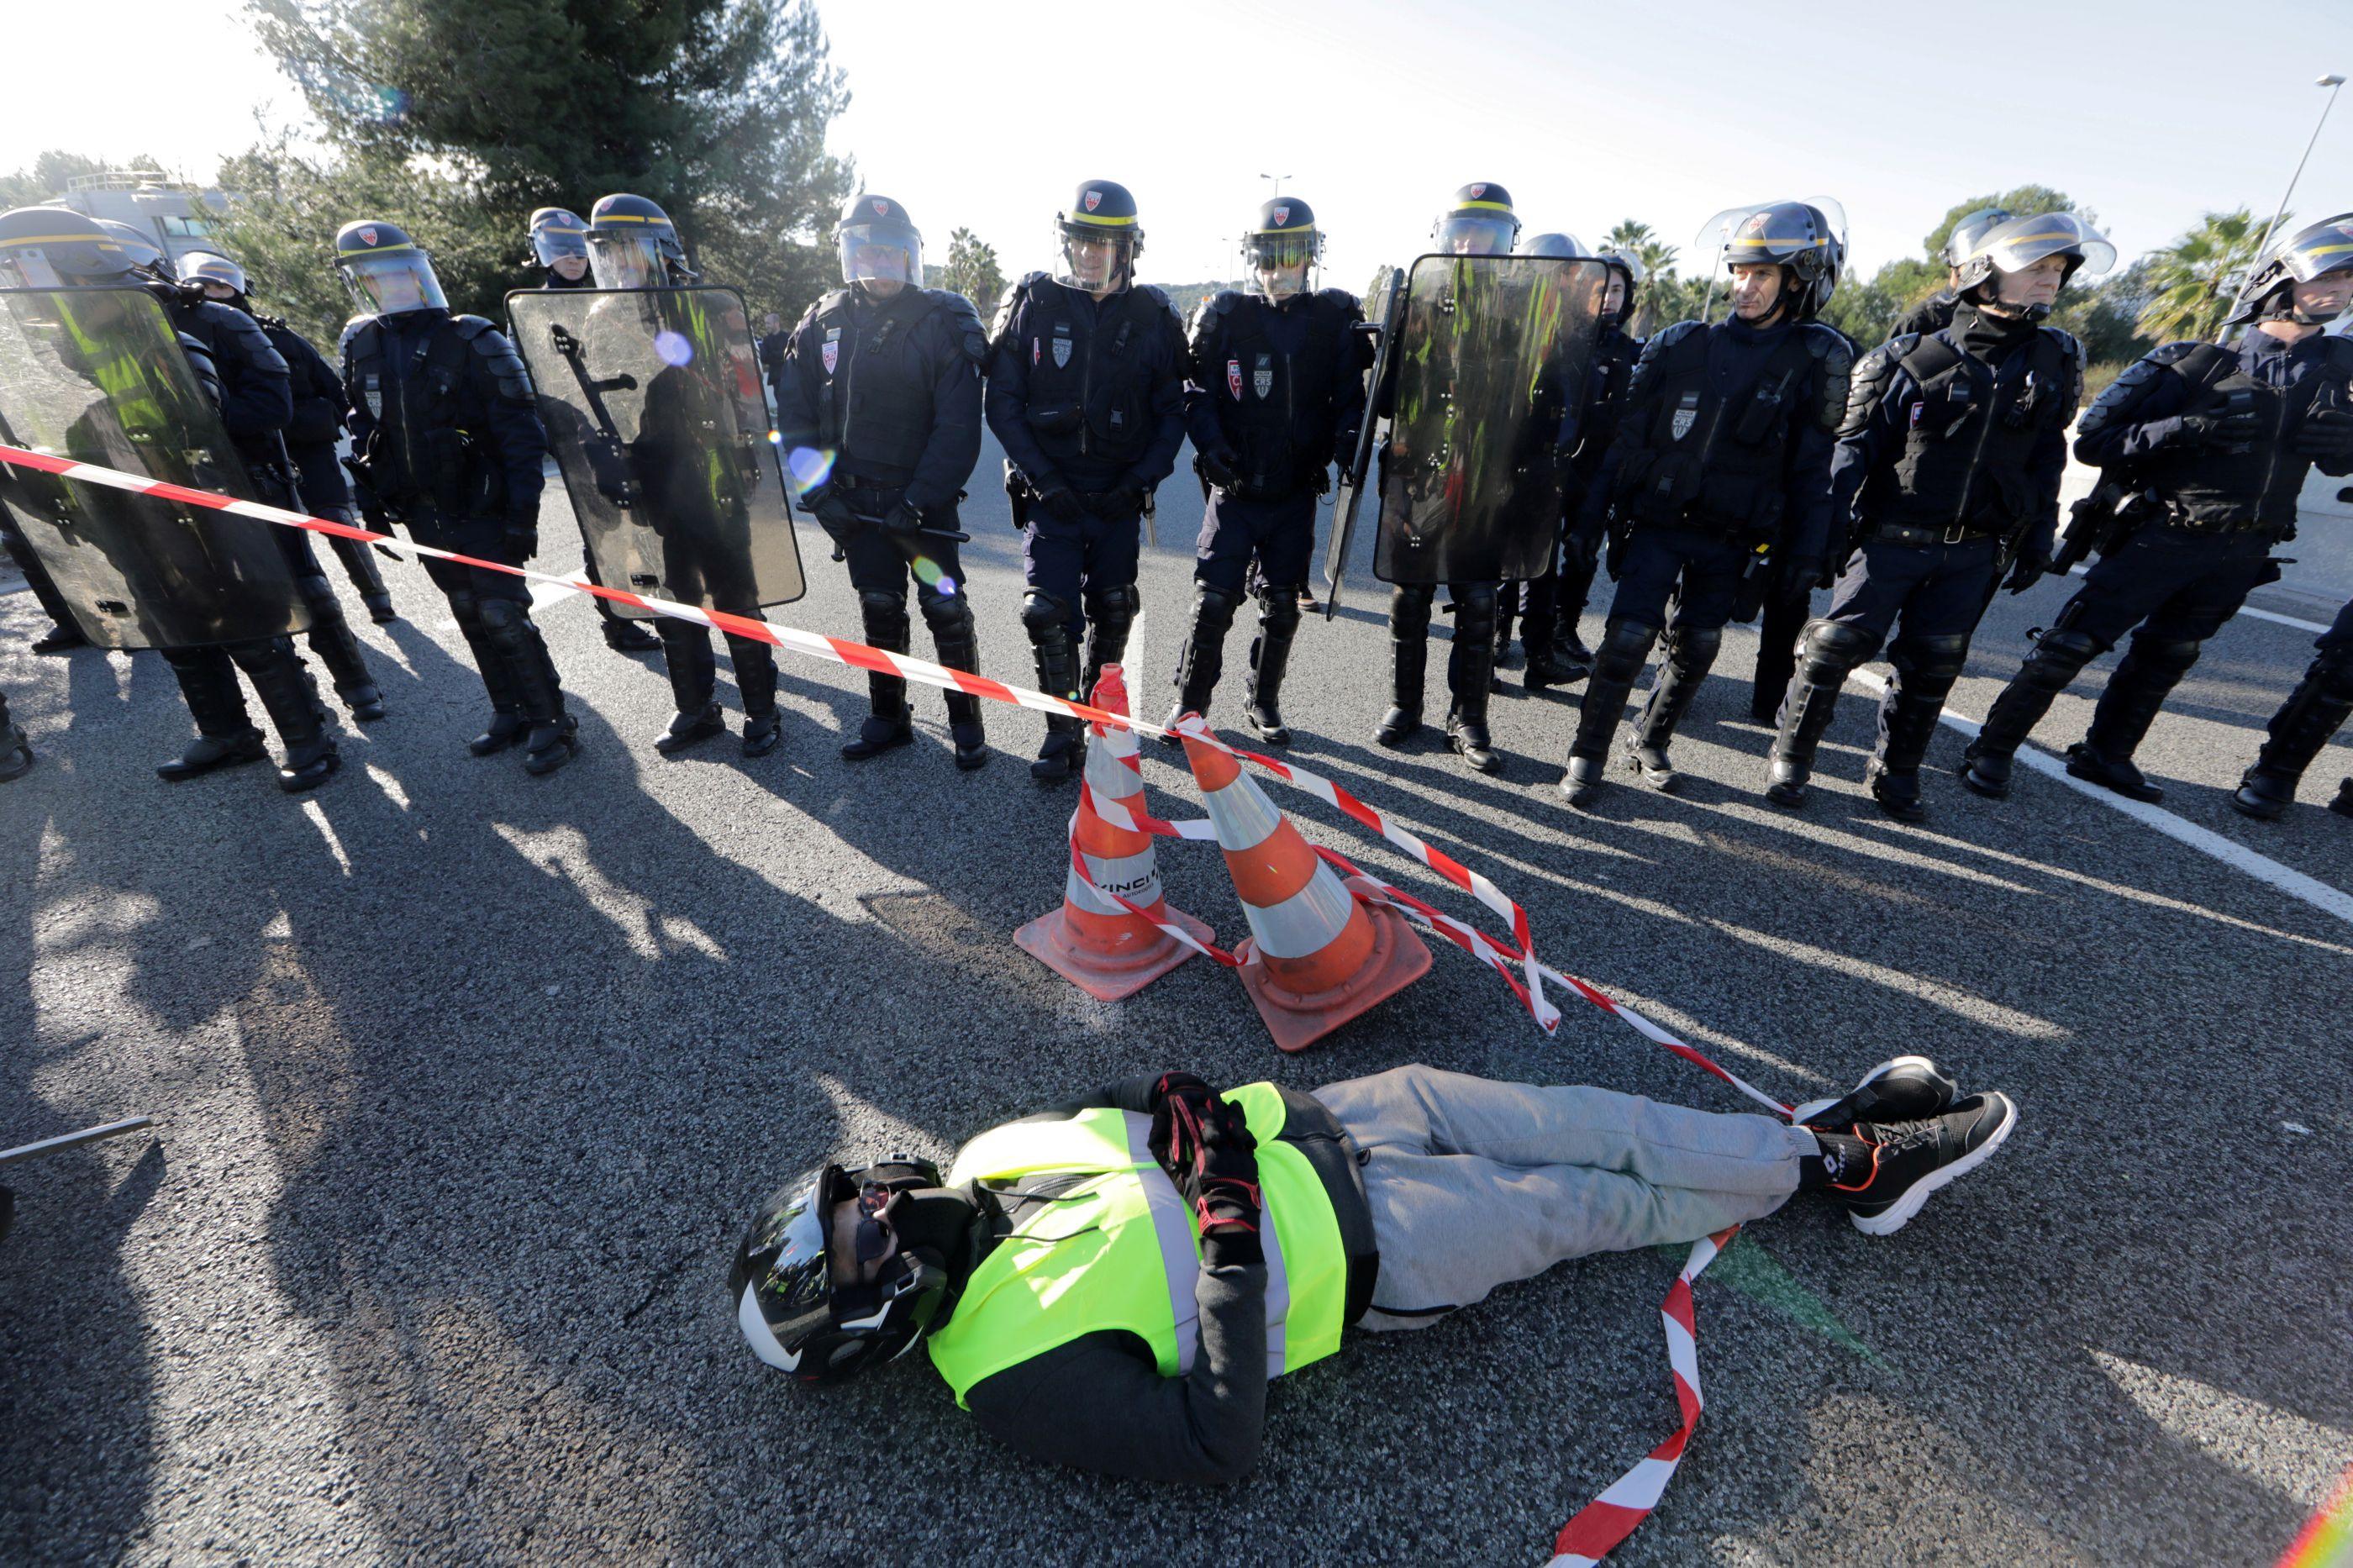 Protestos dos 'coletes amarelos' deixam 16 polícias feridos